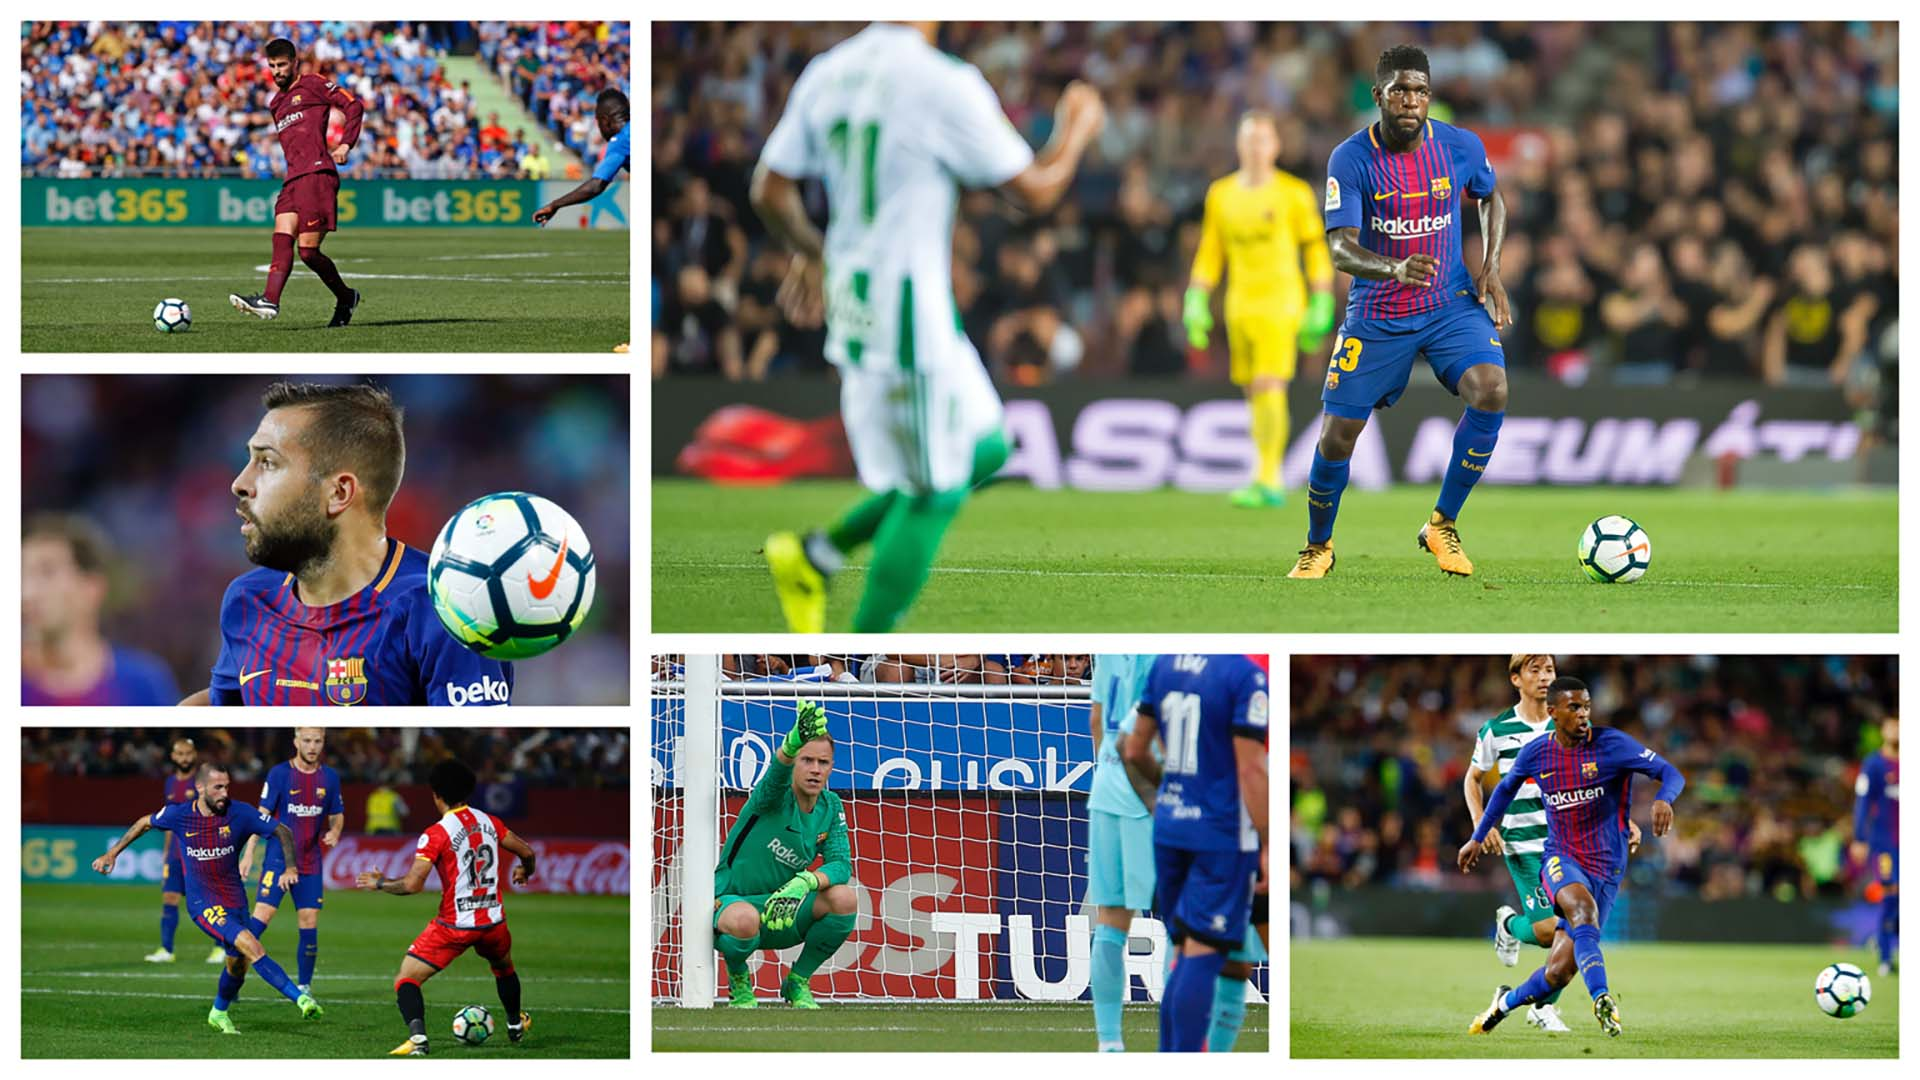 6️⃣ reasons why Barça's defense has been so dominating this season: https://t.co/QCW7zpUf3Q  #ForçaBarça ������ https://t.co/fA8bHnvwL2